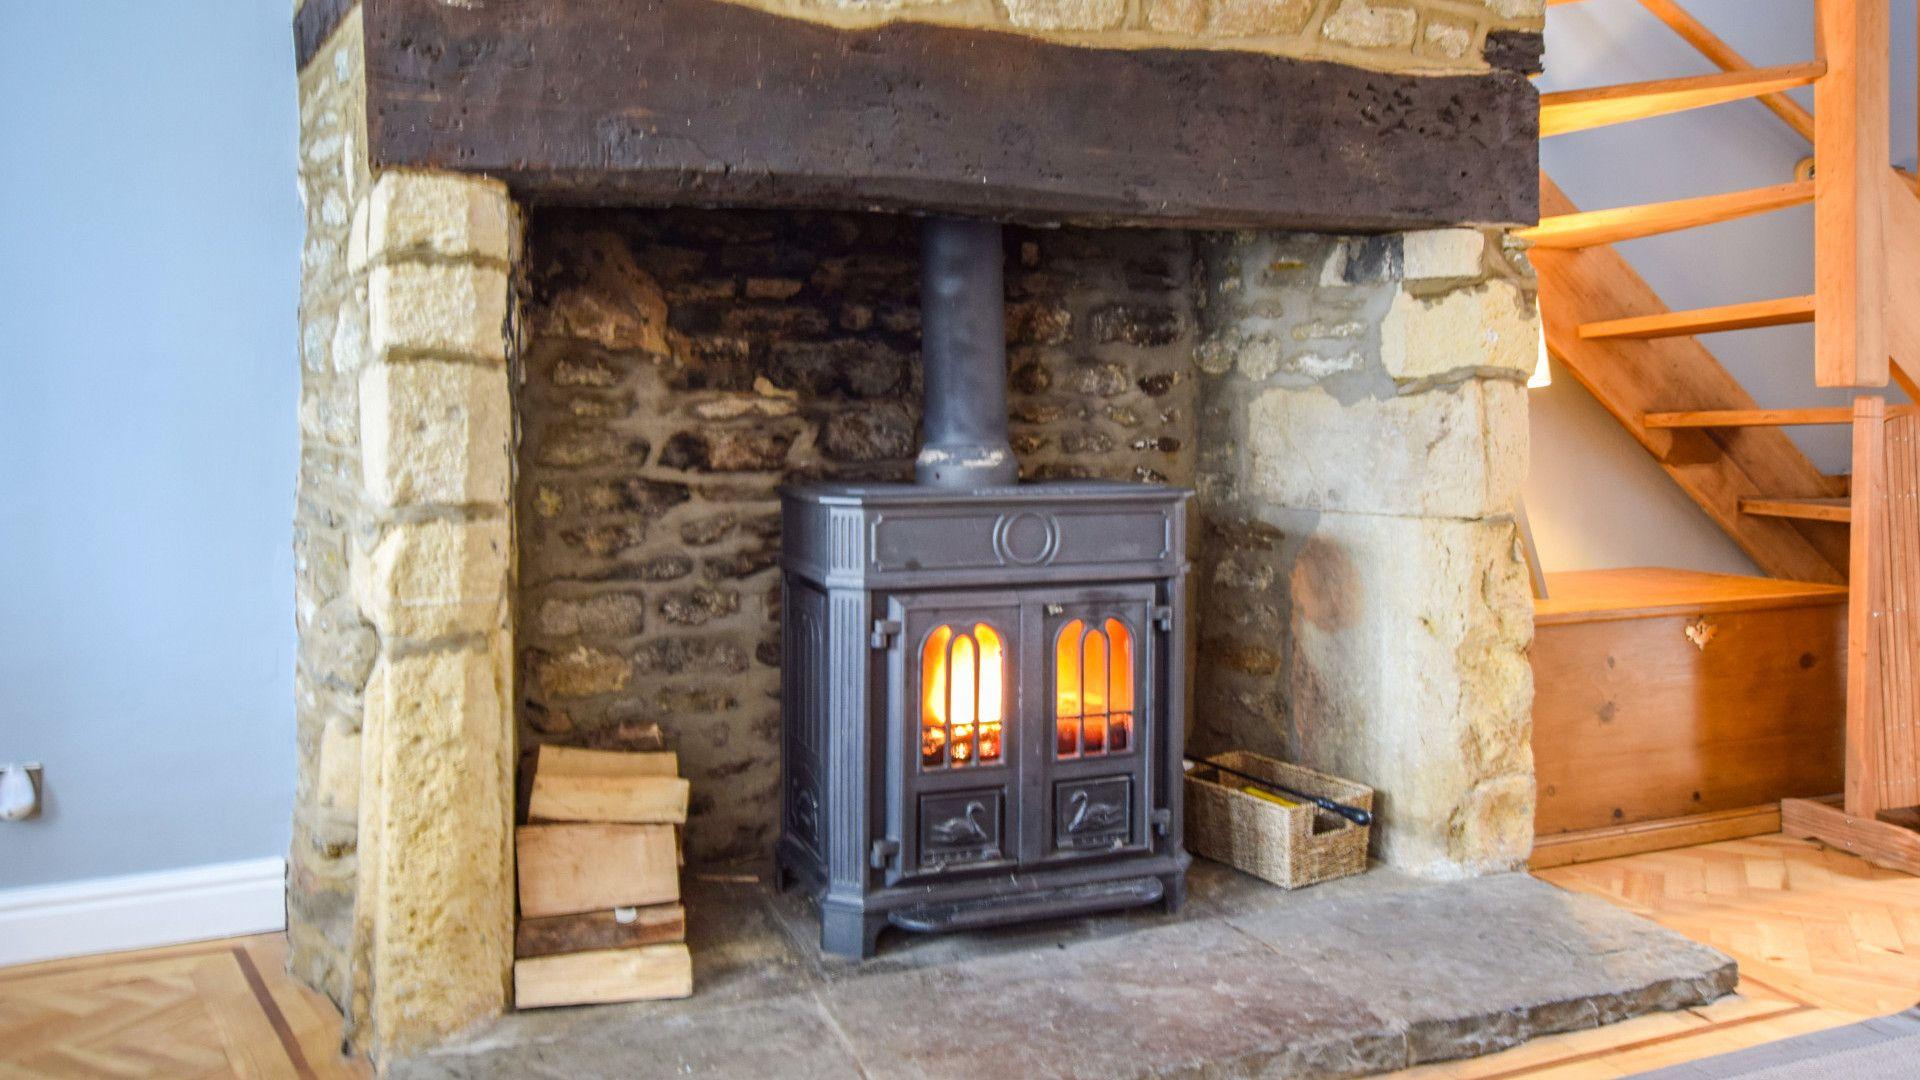 Wood burner in original stone fireplace,  27 Horsefair, Bolthole Retreats